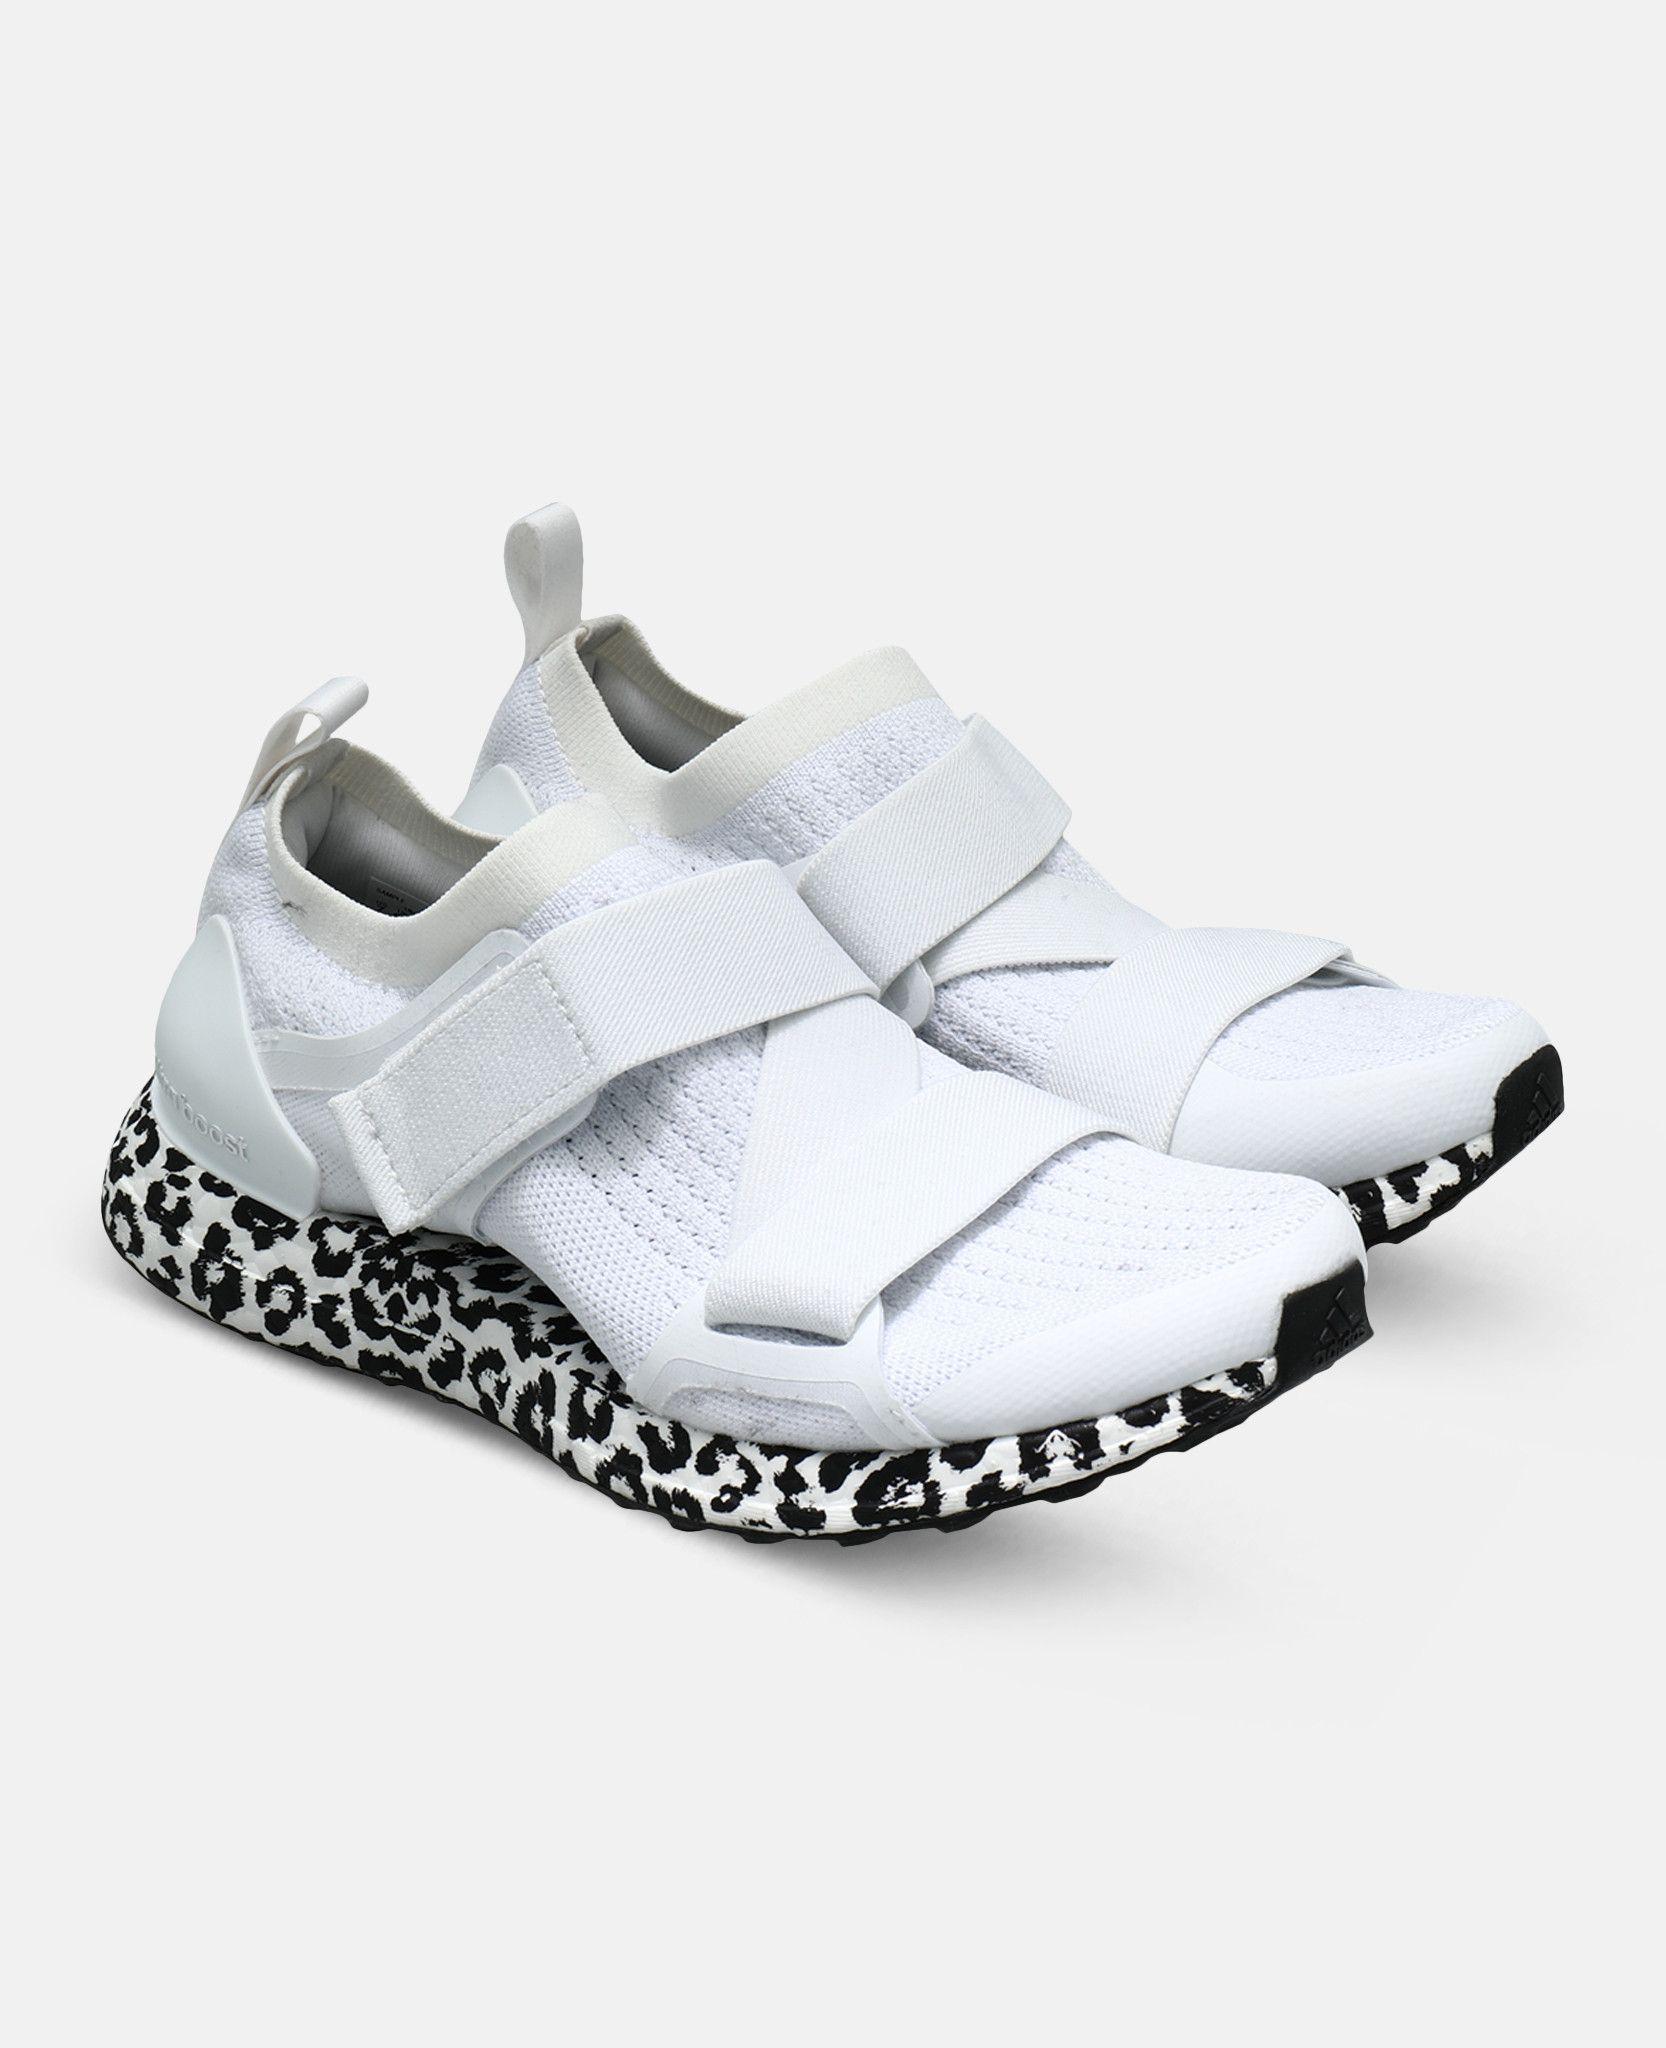 d28feb5b486 ADIDAS by STELLA McCARTNEY White Ultraboost X Sneakers Running Footwear  Woman h